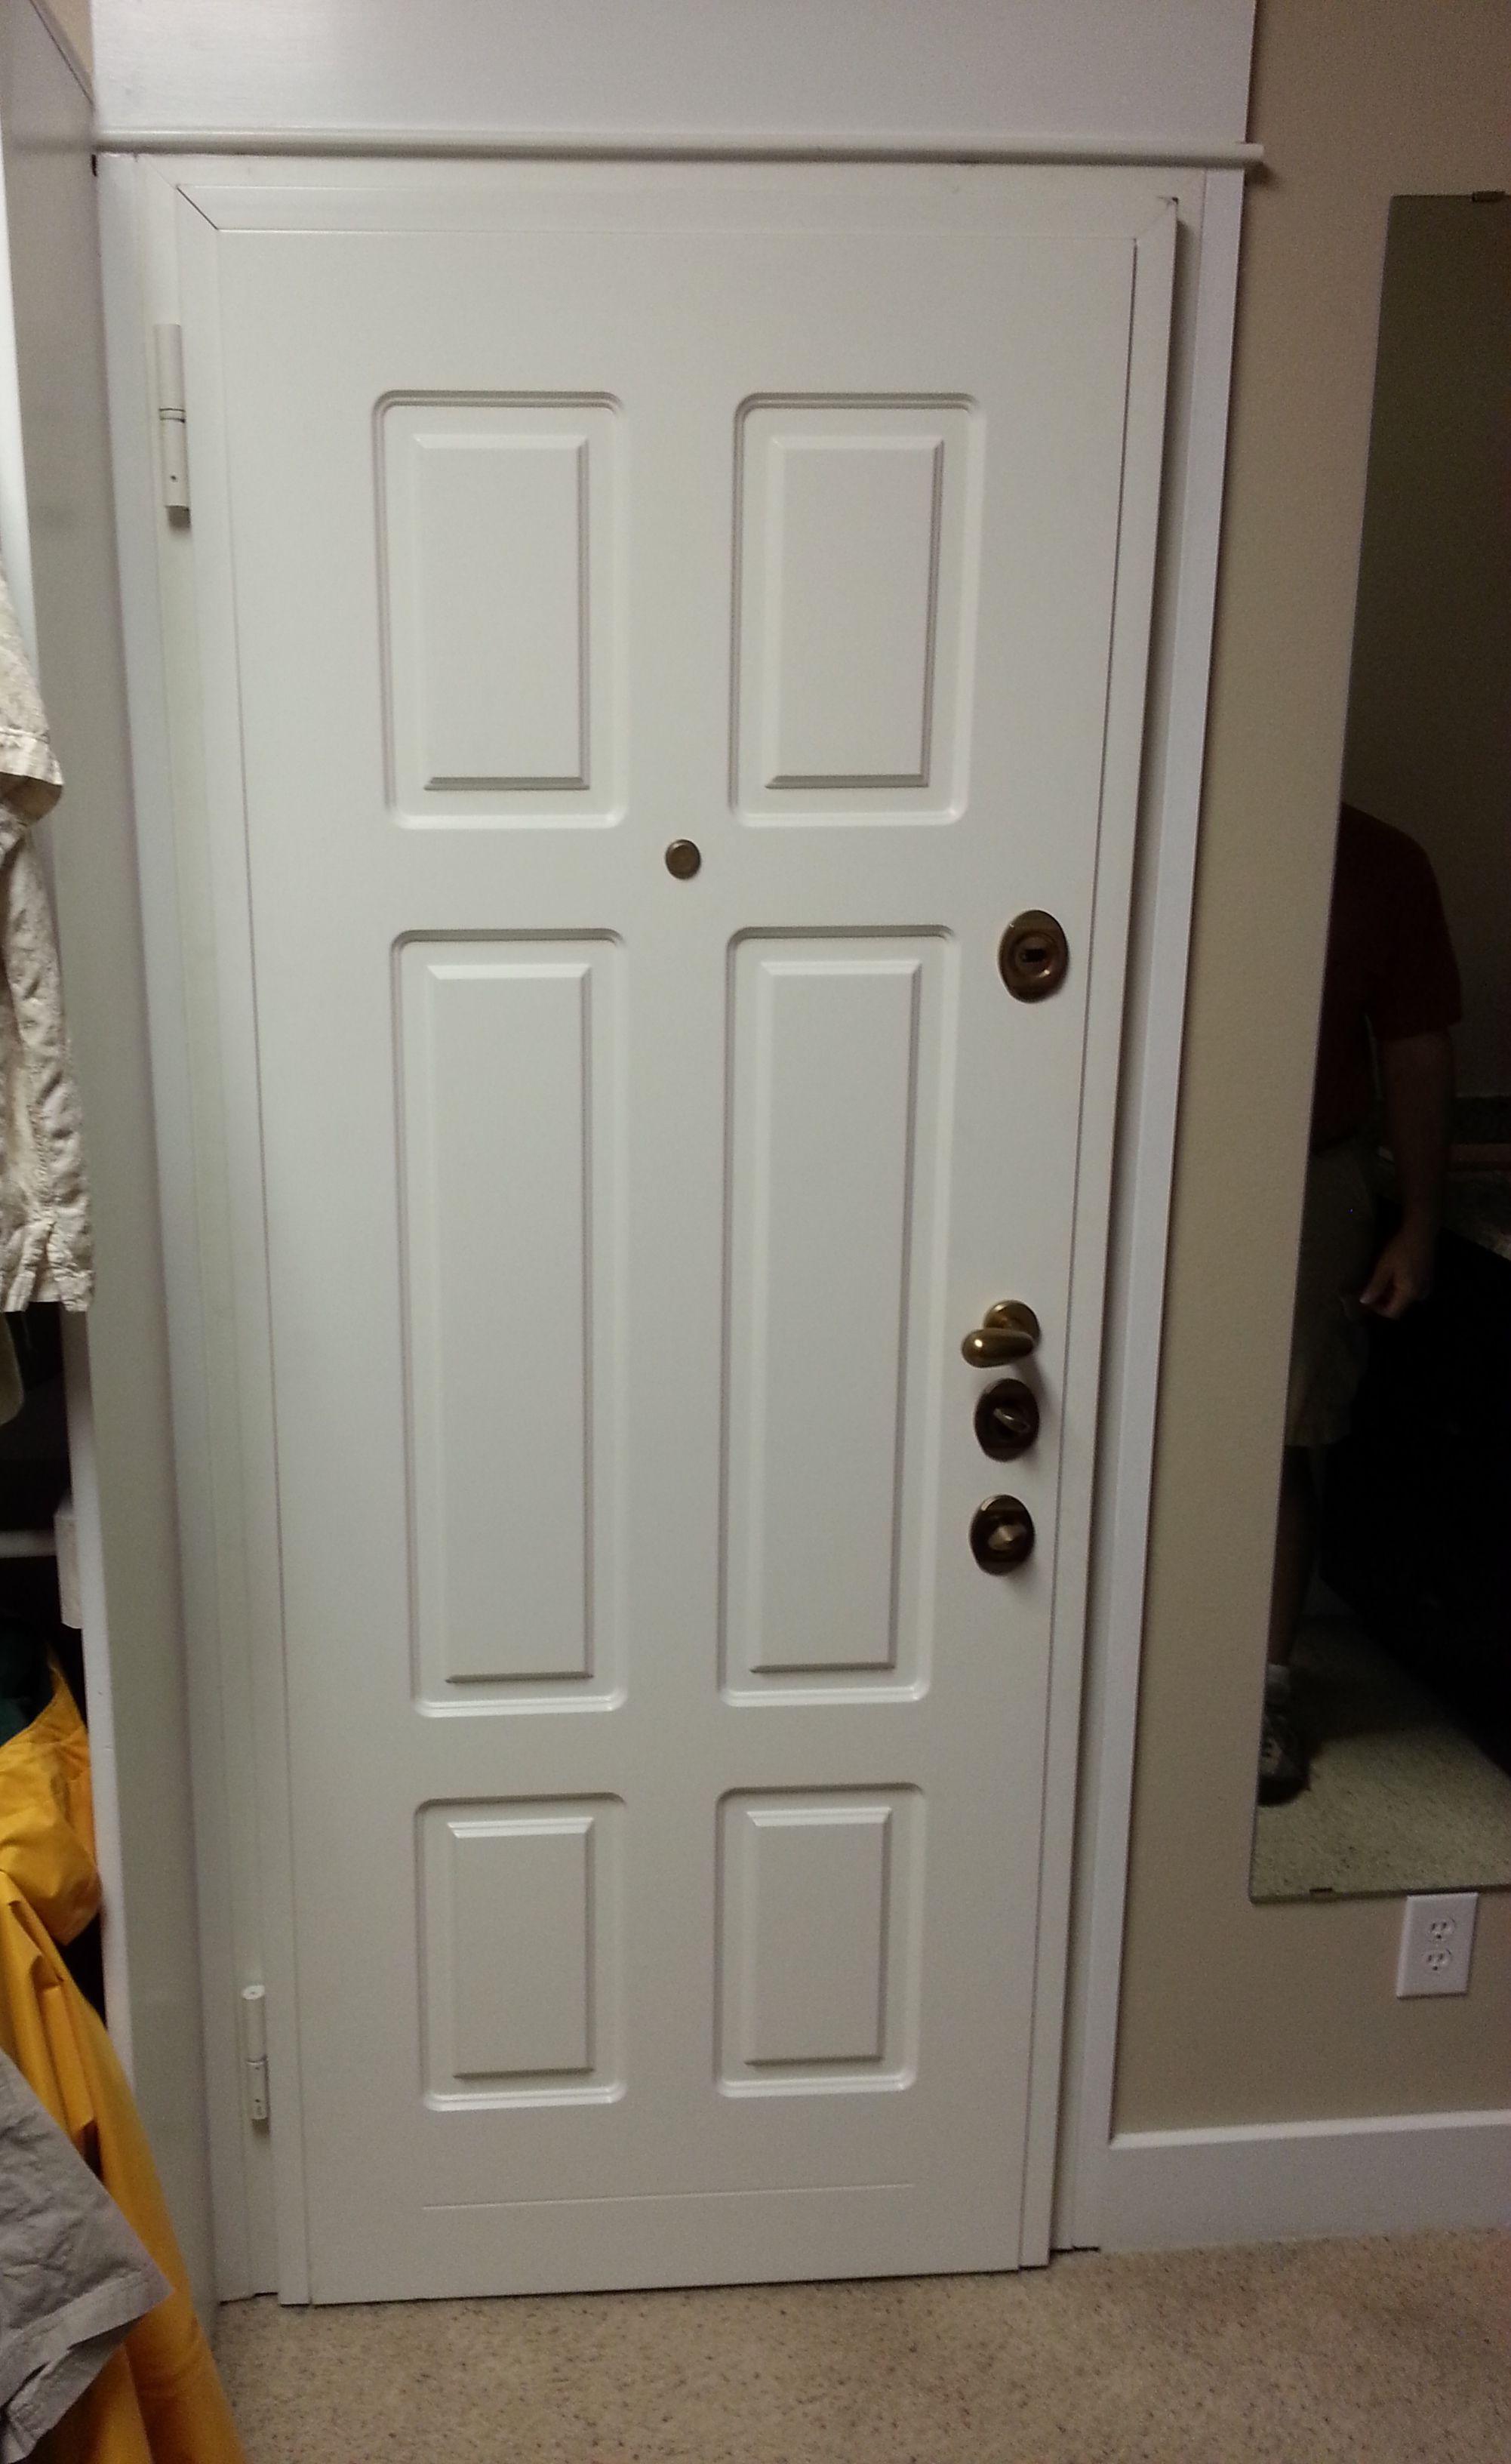 Superb Safe Room Closet Steel Security Door, Bathroom To Closet, MDF Panel.  Multi Point Locking System